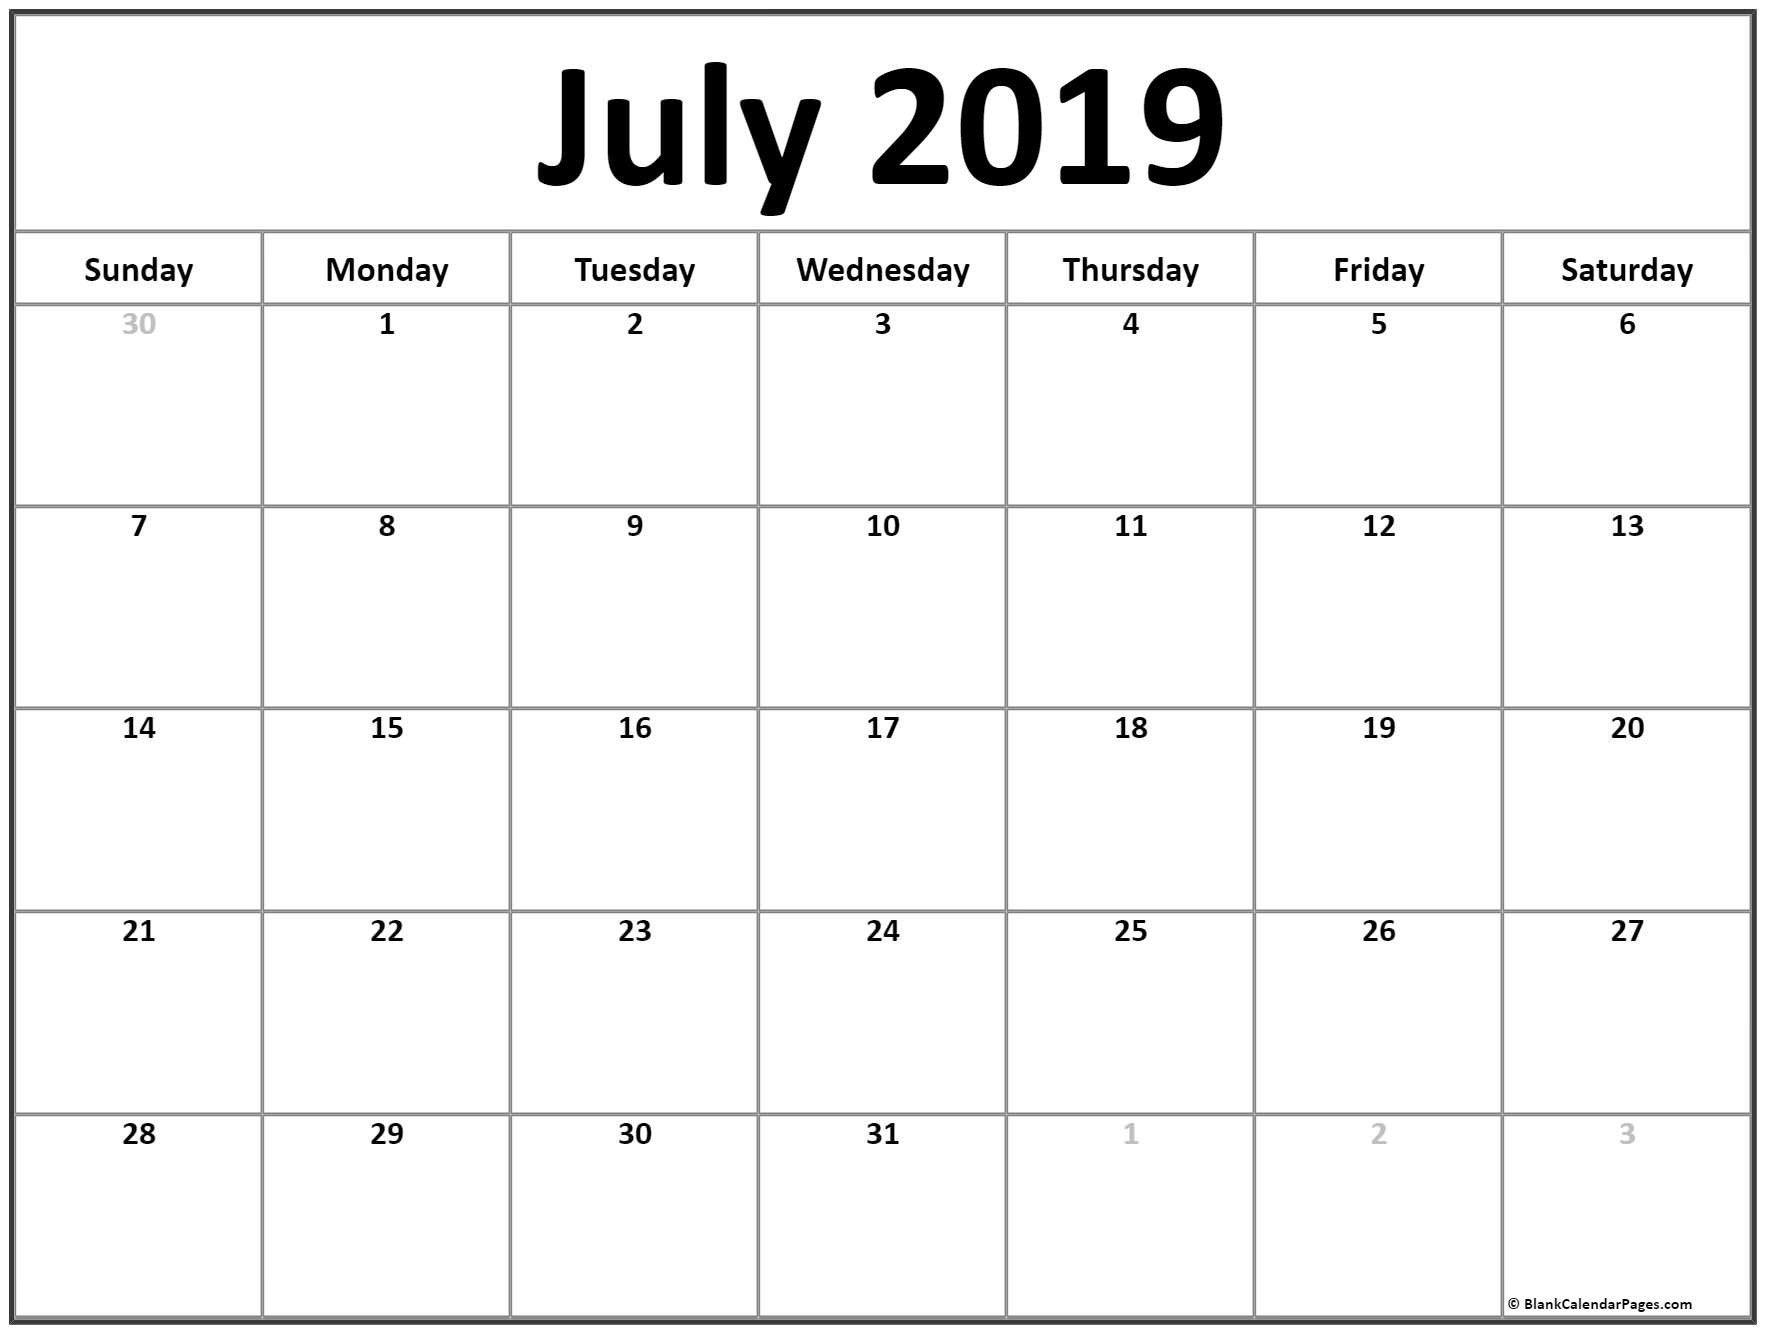 July 2019 Blank Calendar Template | 2019 July Calendar